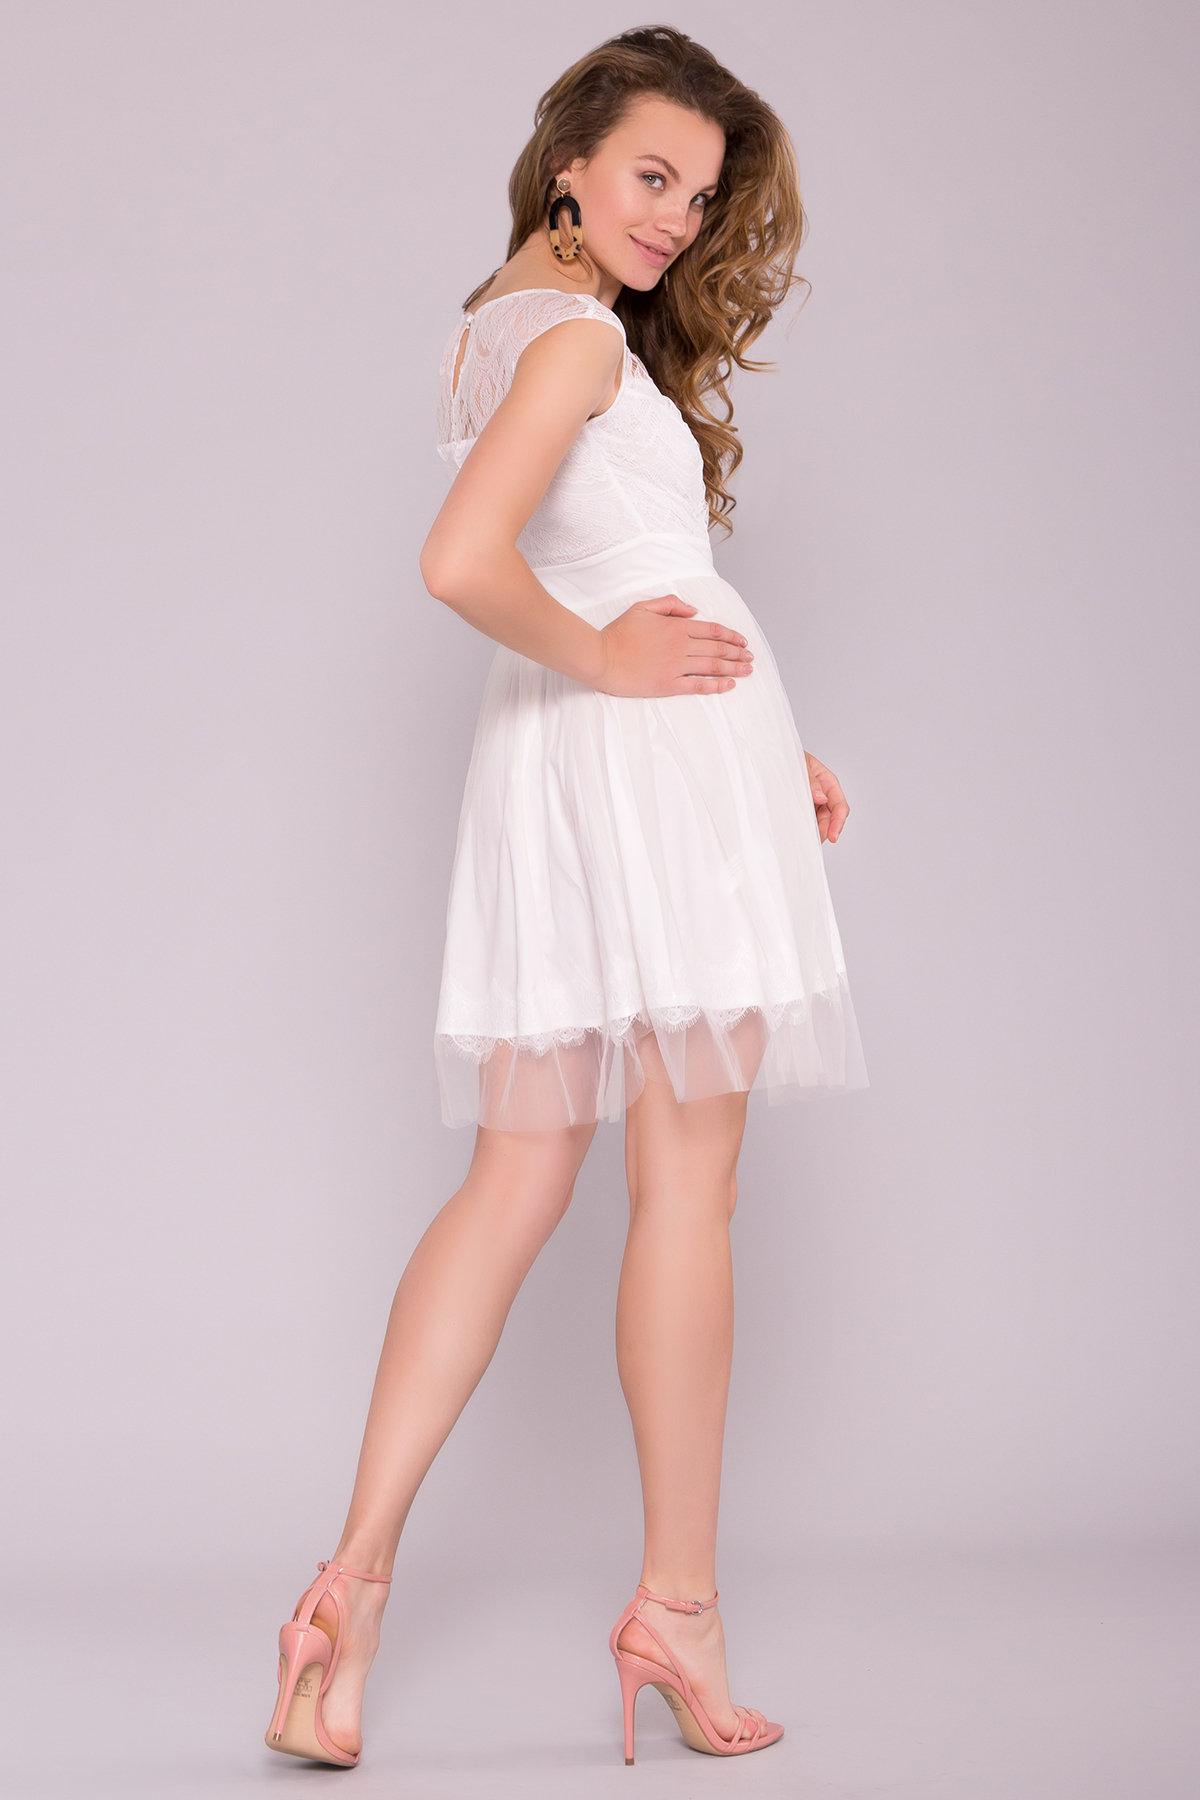 Платье Амур лайт 6913 Цвет: Молоко 2/молоко